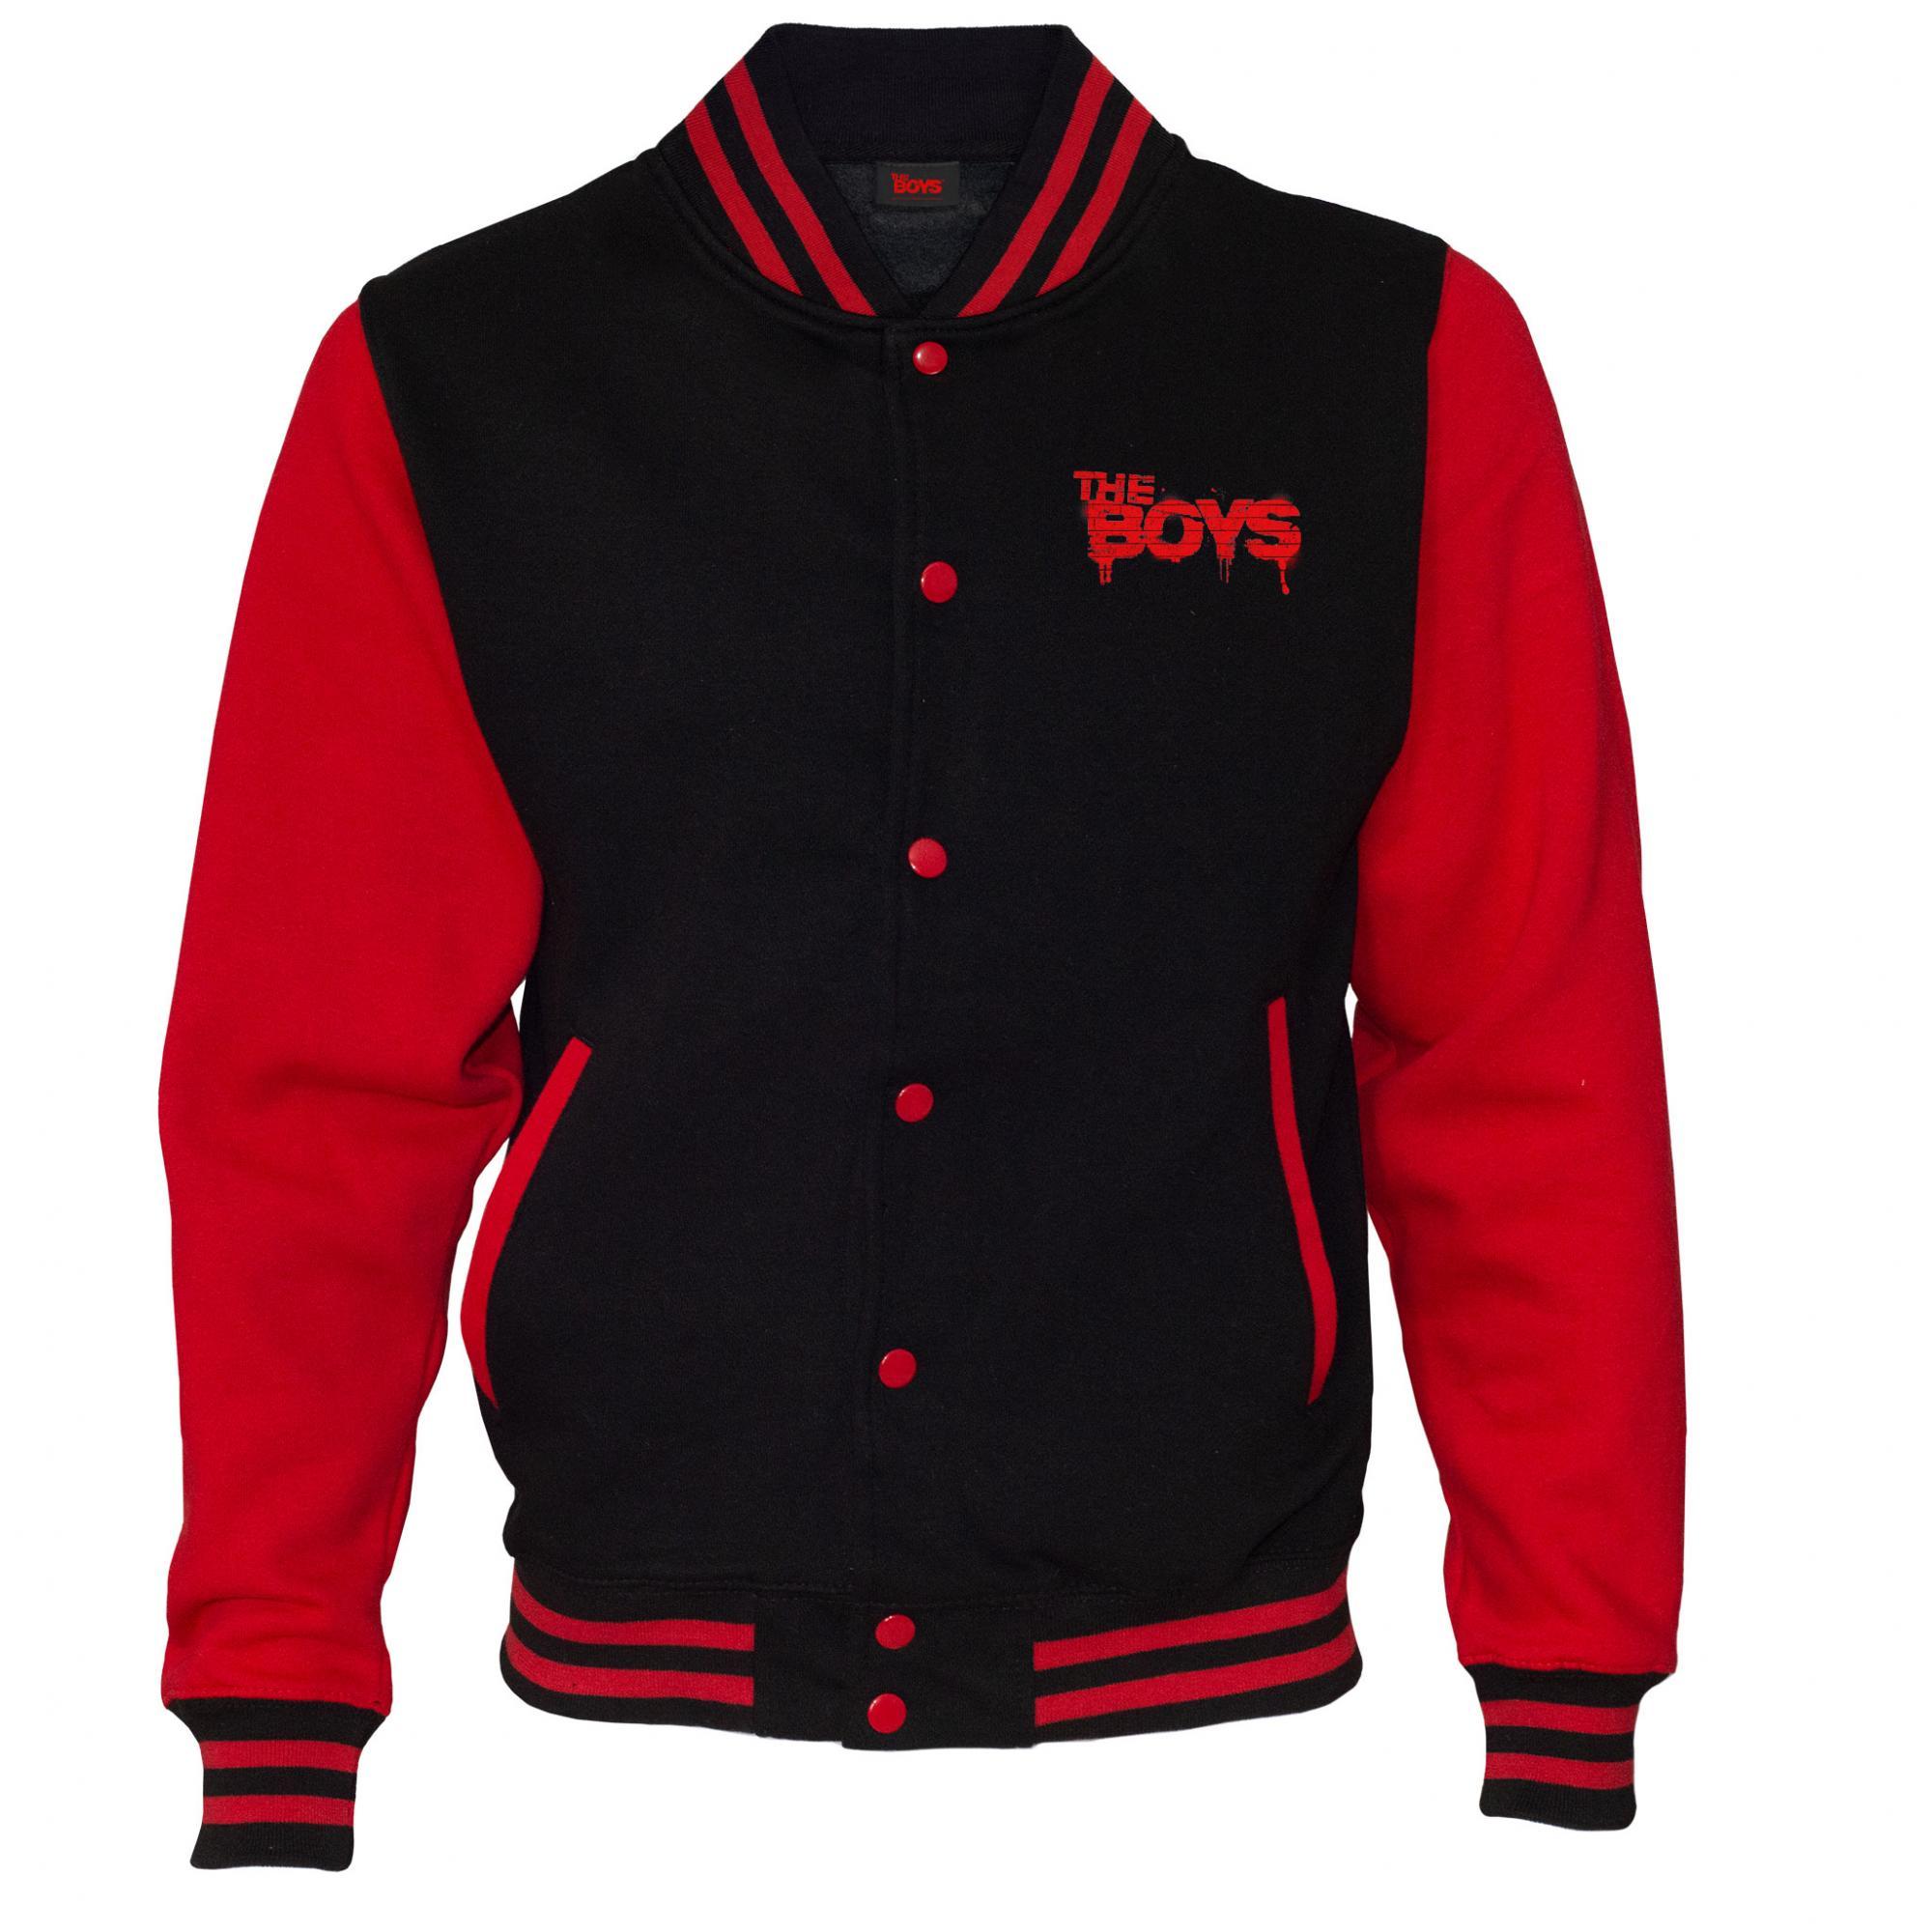 The Boys Womens/Ladies Supes Graffiti Varsity Jacket (3XL) (Red/Black)